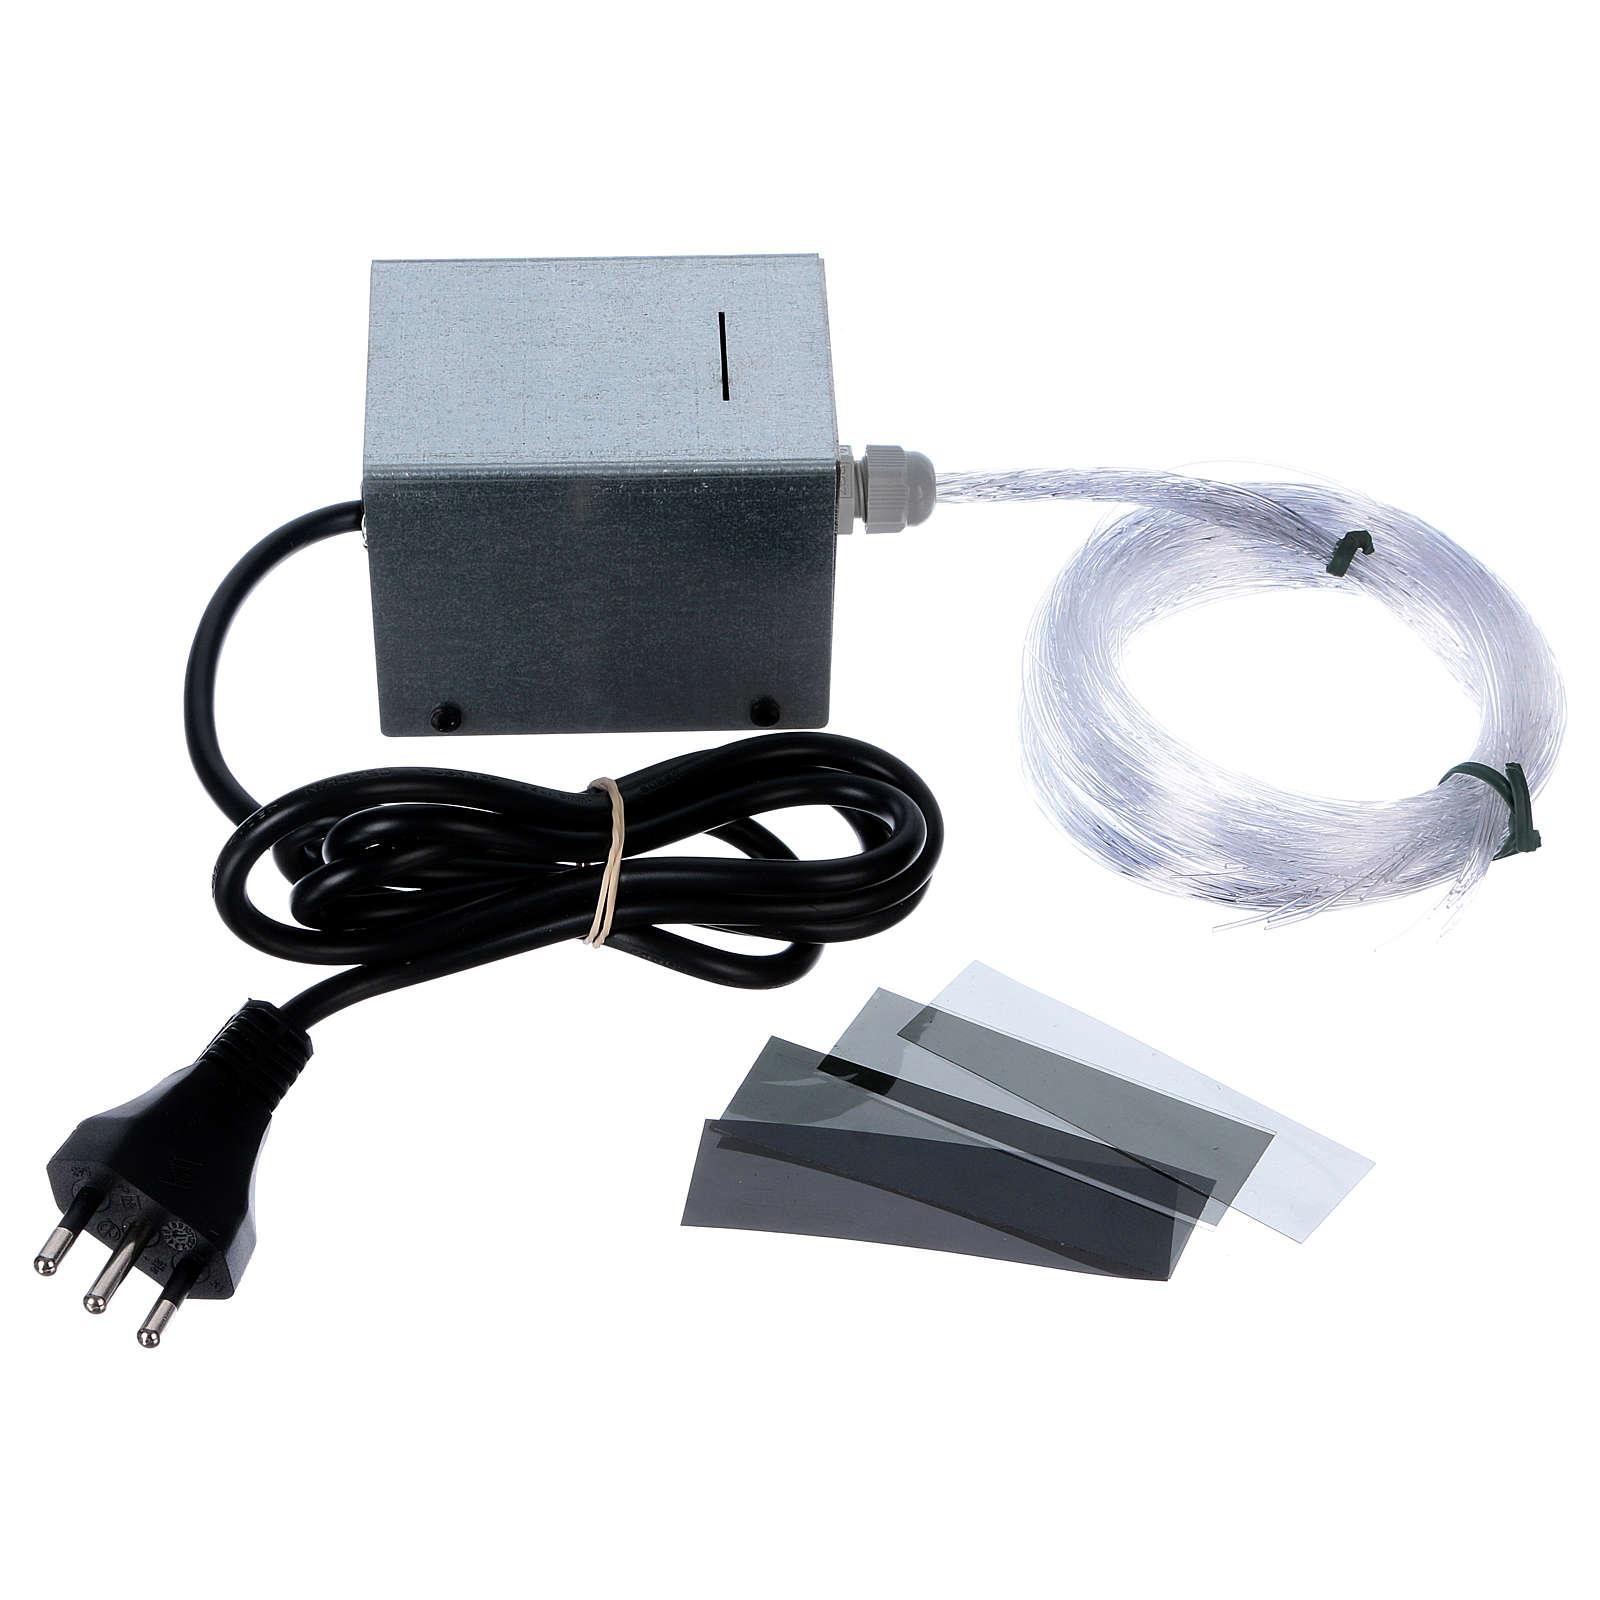 Circuito de control estrellas de fibra óptica Lght Filter 30 hilos surtidos para belén 4